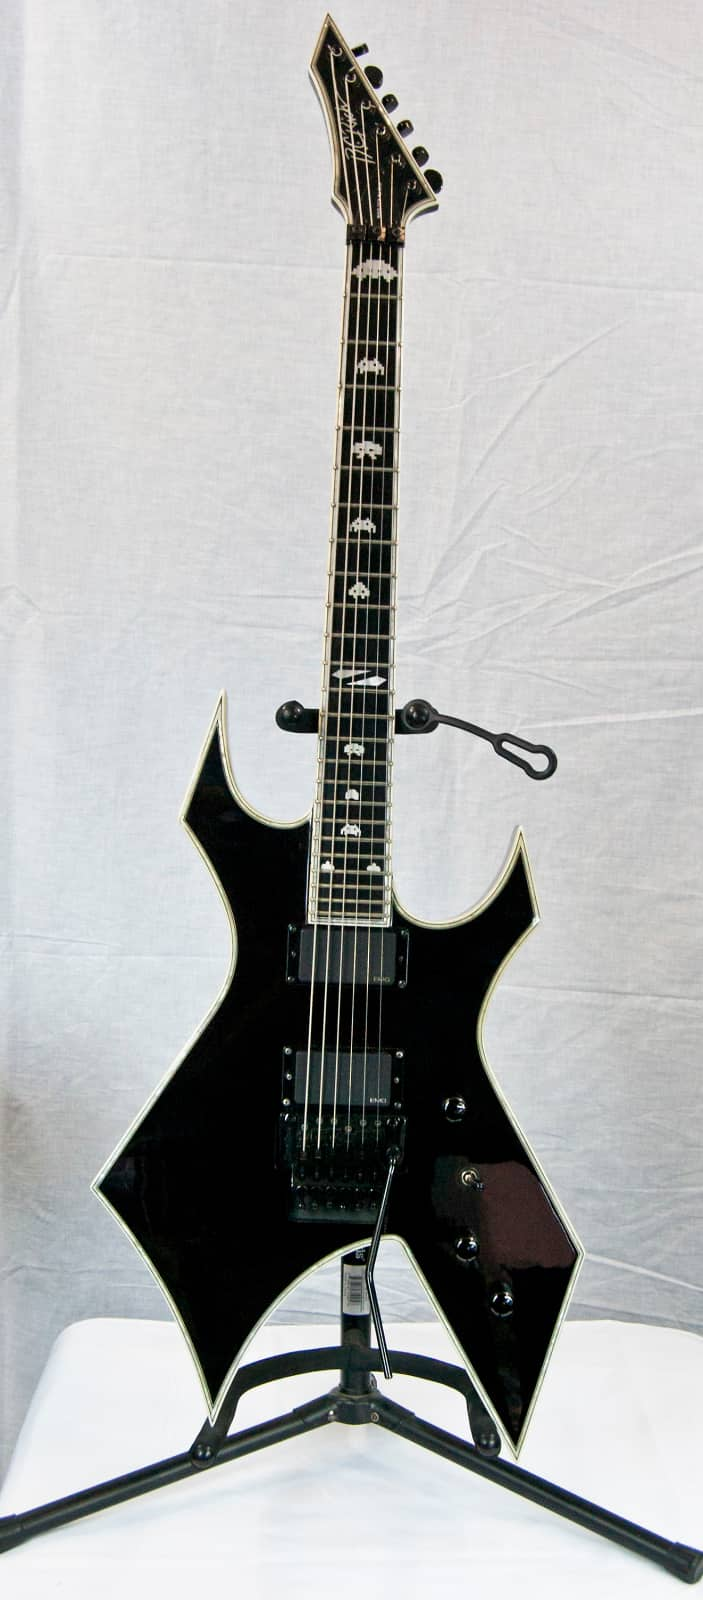 b c rich nj deluxe warlock electric guitar onyx w hard shell reverb. Black Bedroom Furniture Sets. Home Design Ideas